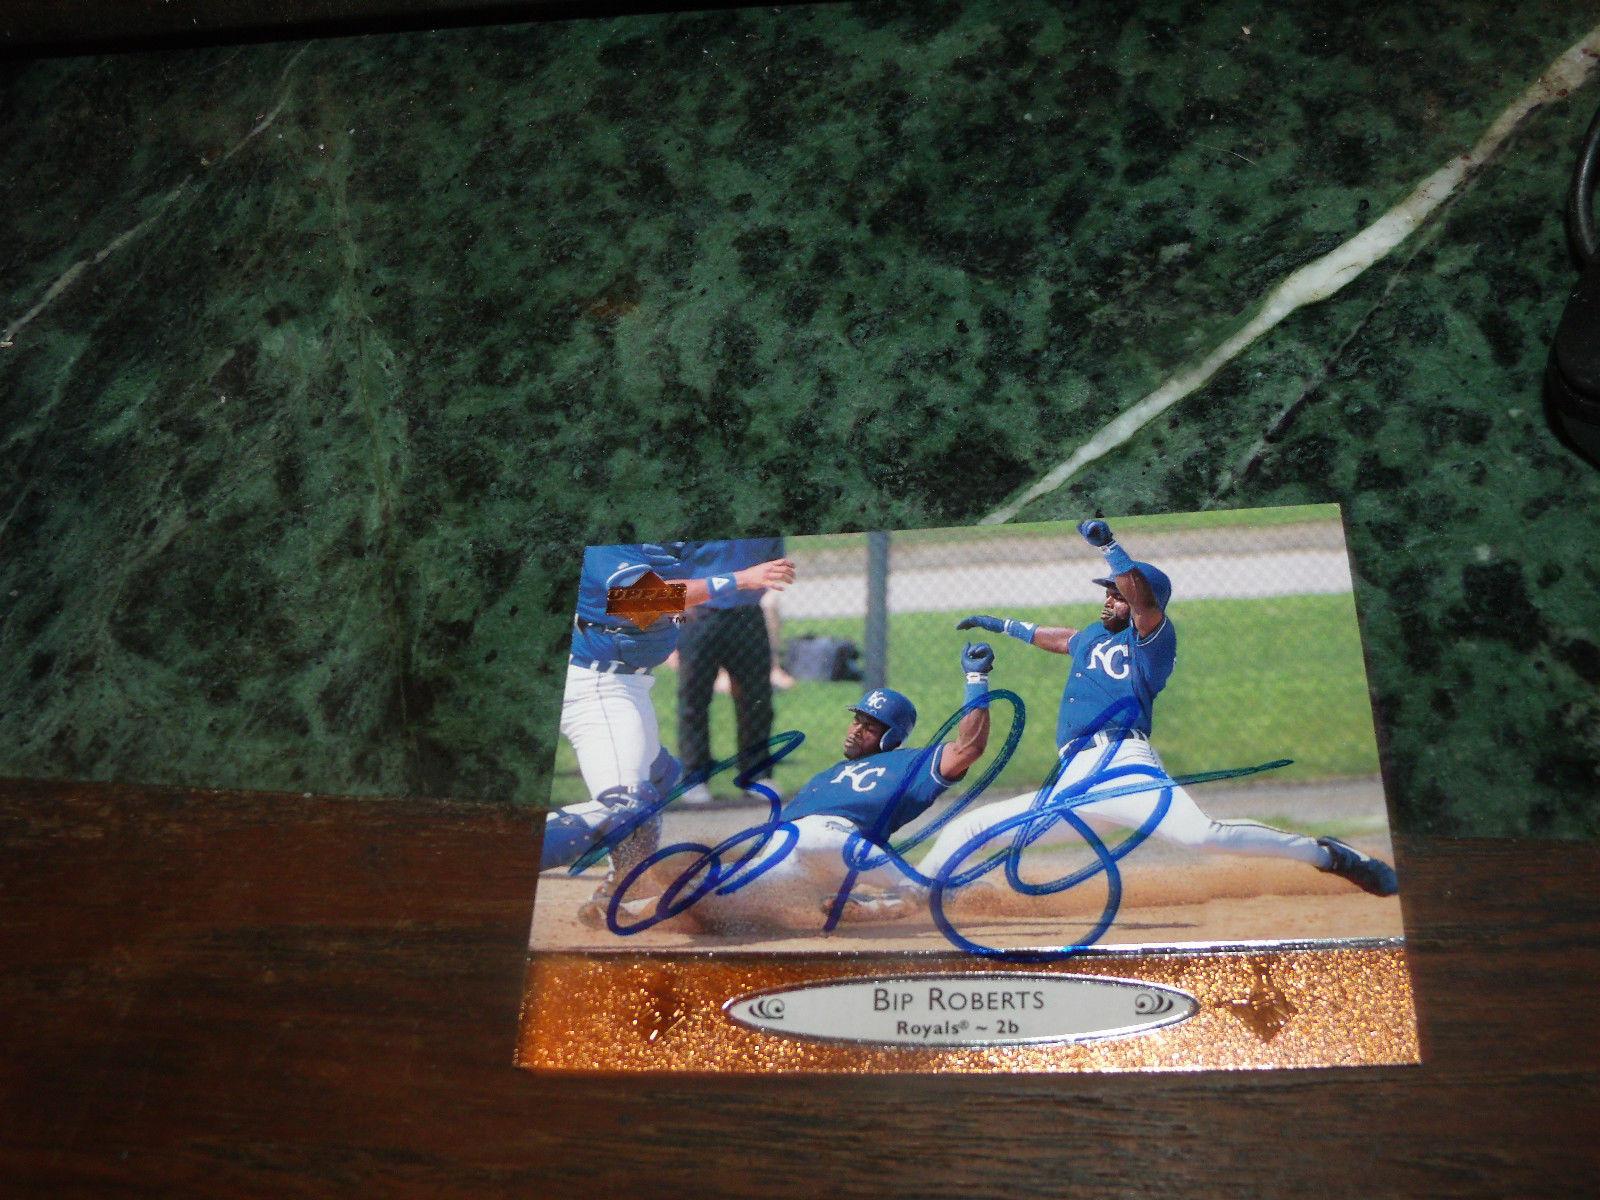 BIP ROBERTS HAND SIGNED 1996 UPPER DECK BASEBALL CARD ROYALS